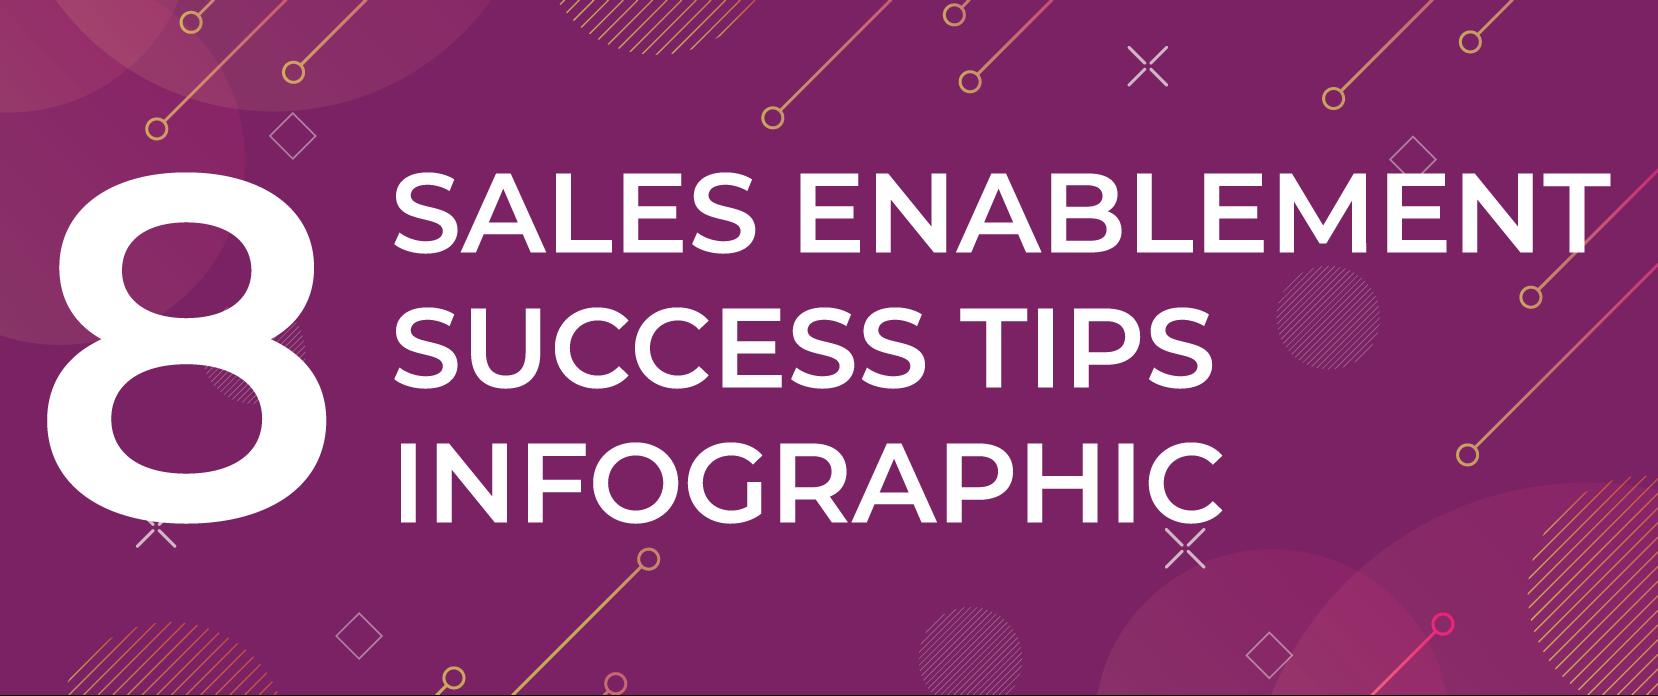 8 Sales Enablement Success Tips